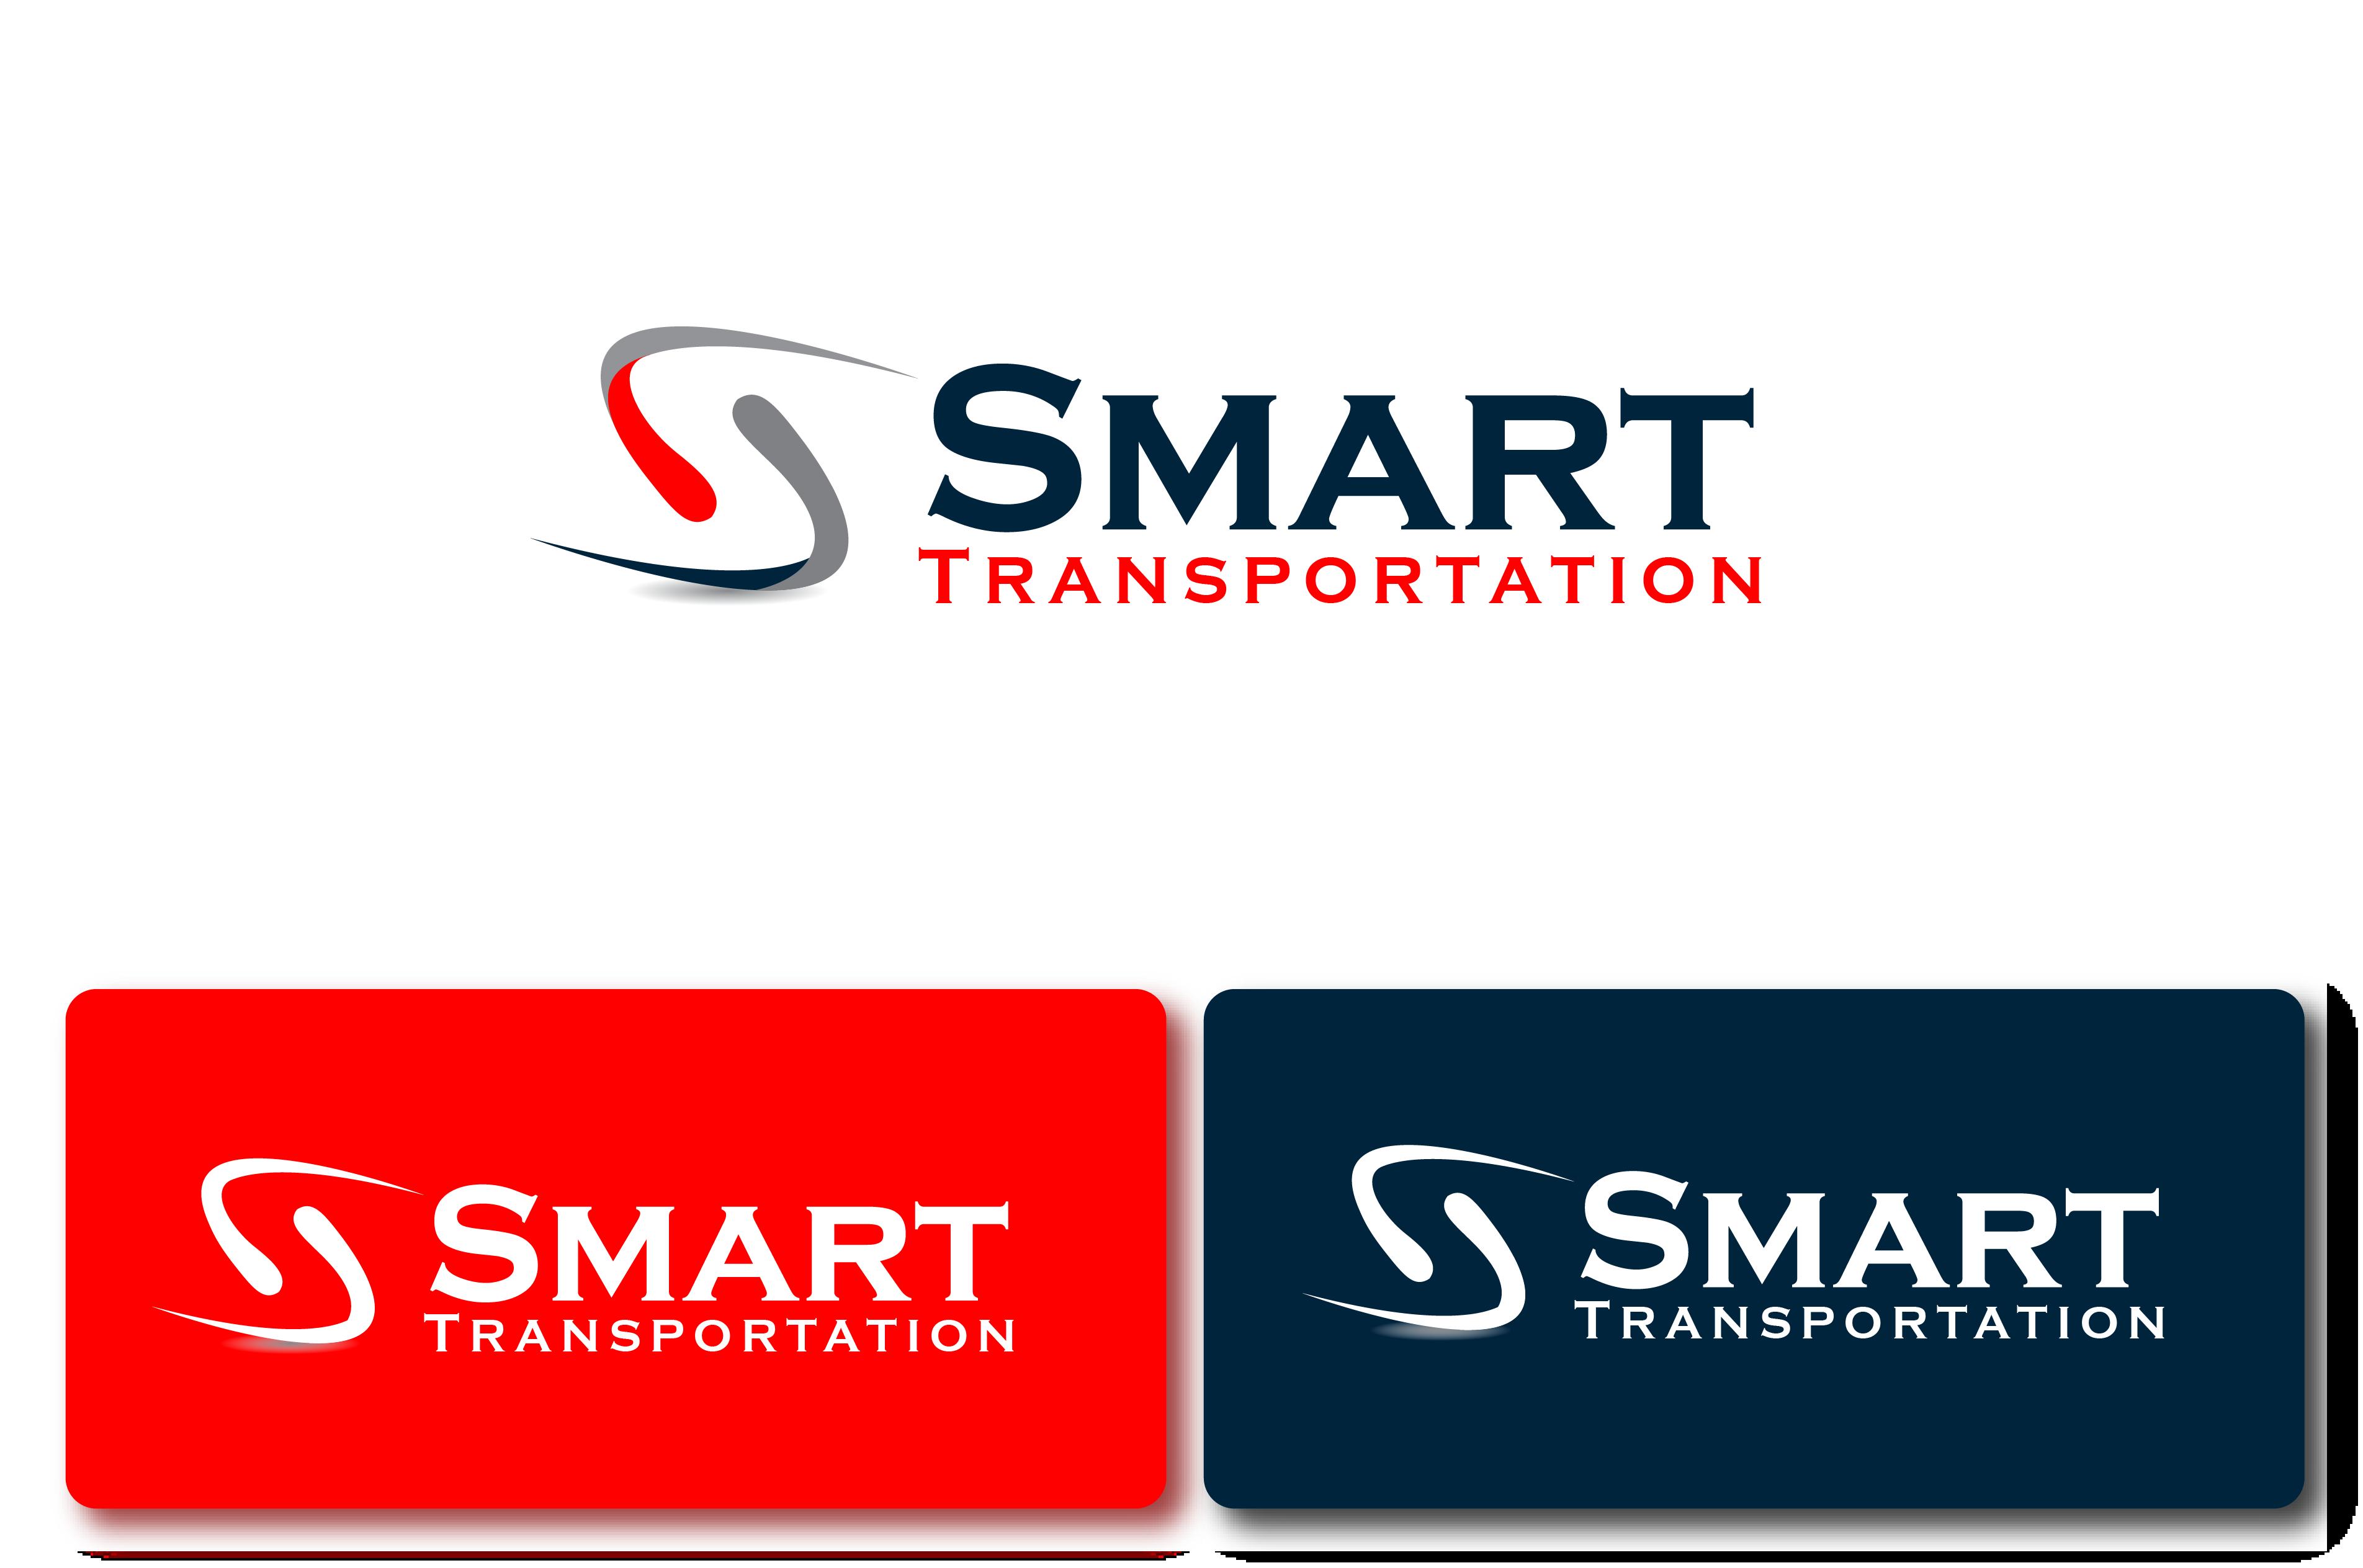 Logo Design by Private User - Entry No. 157 in the Logo Design Contest Imaginative Logo Design for Smart Transportation.